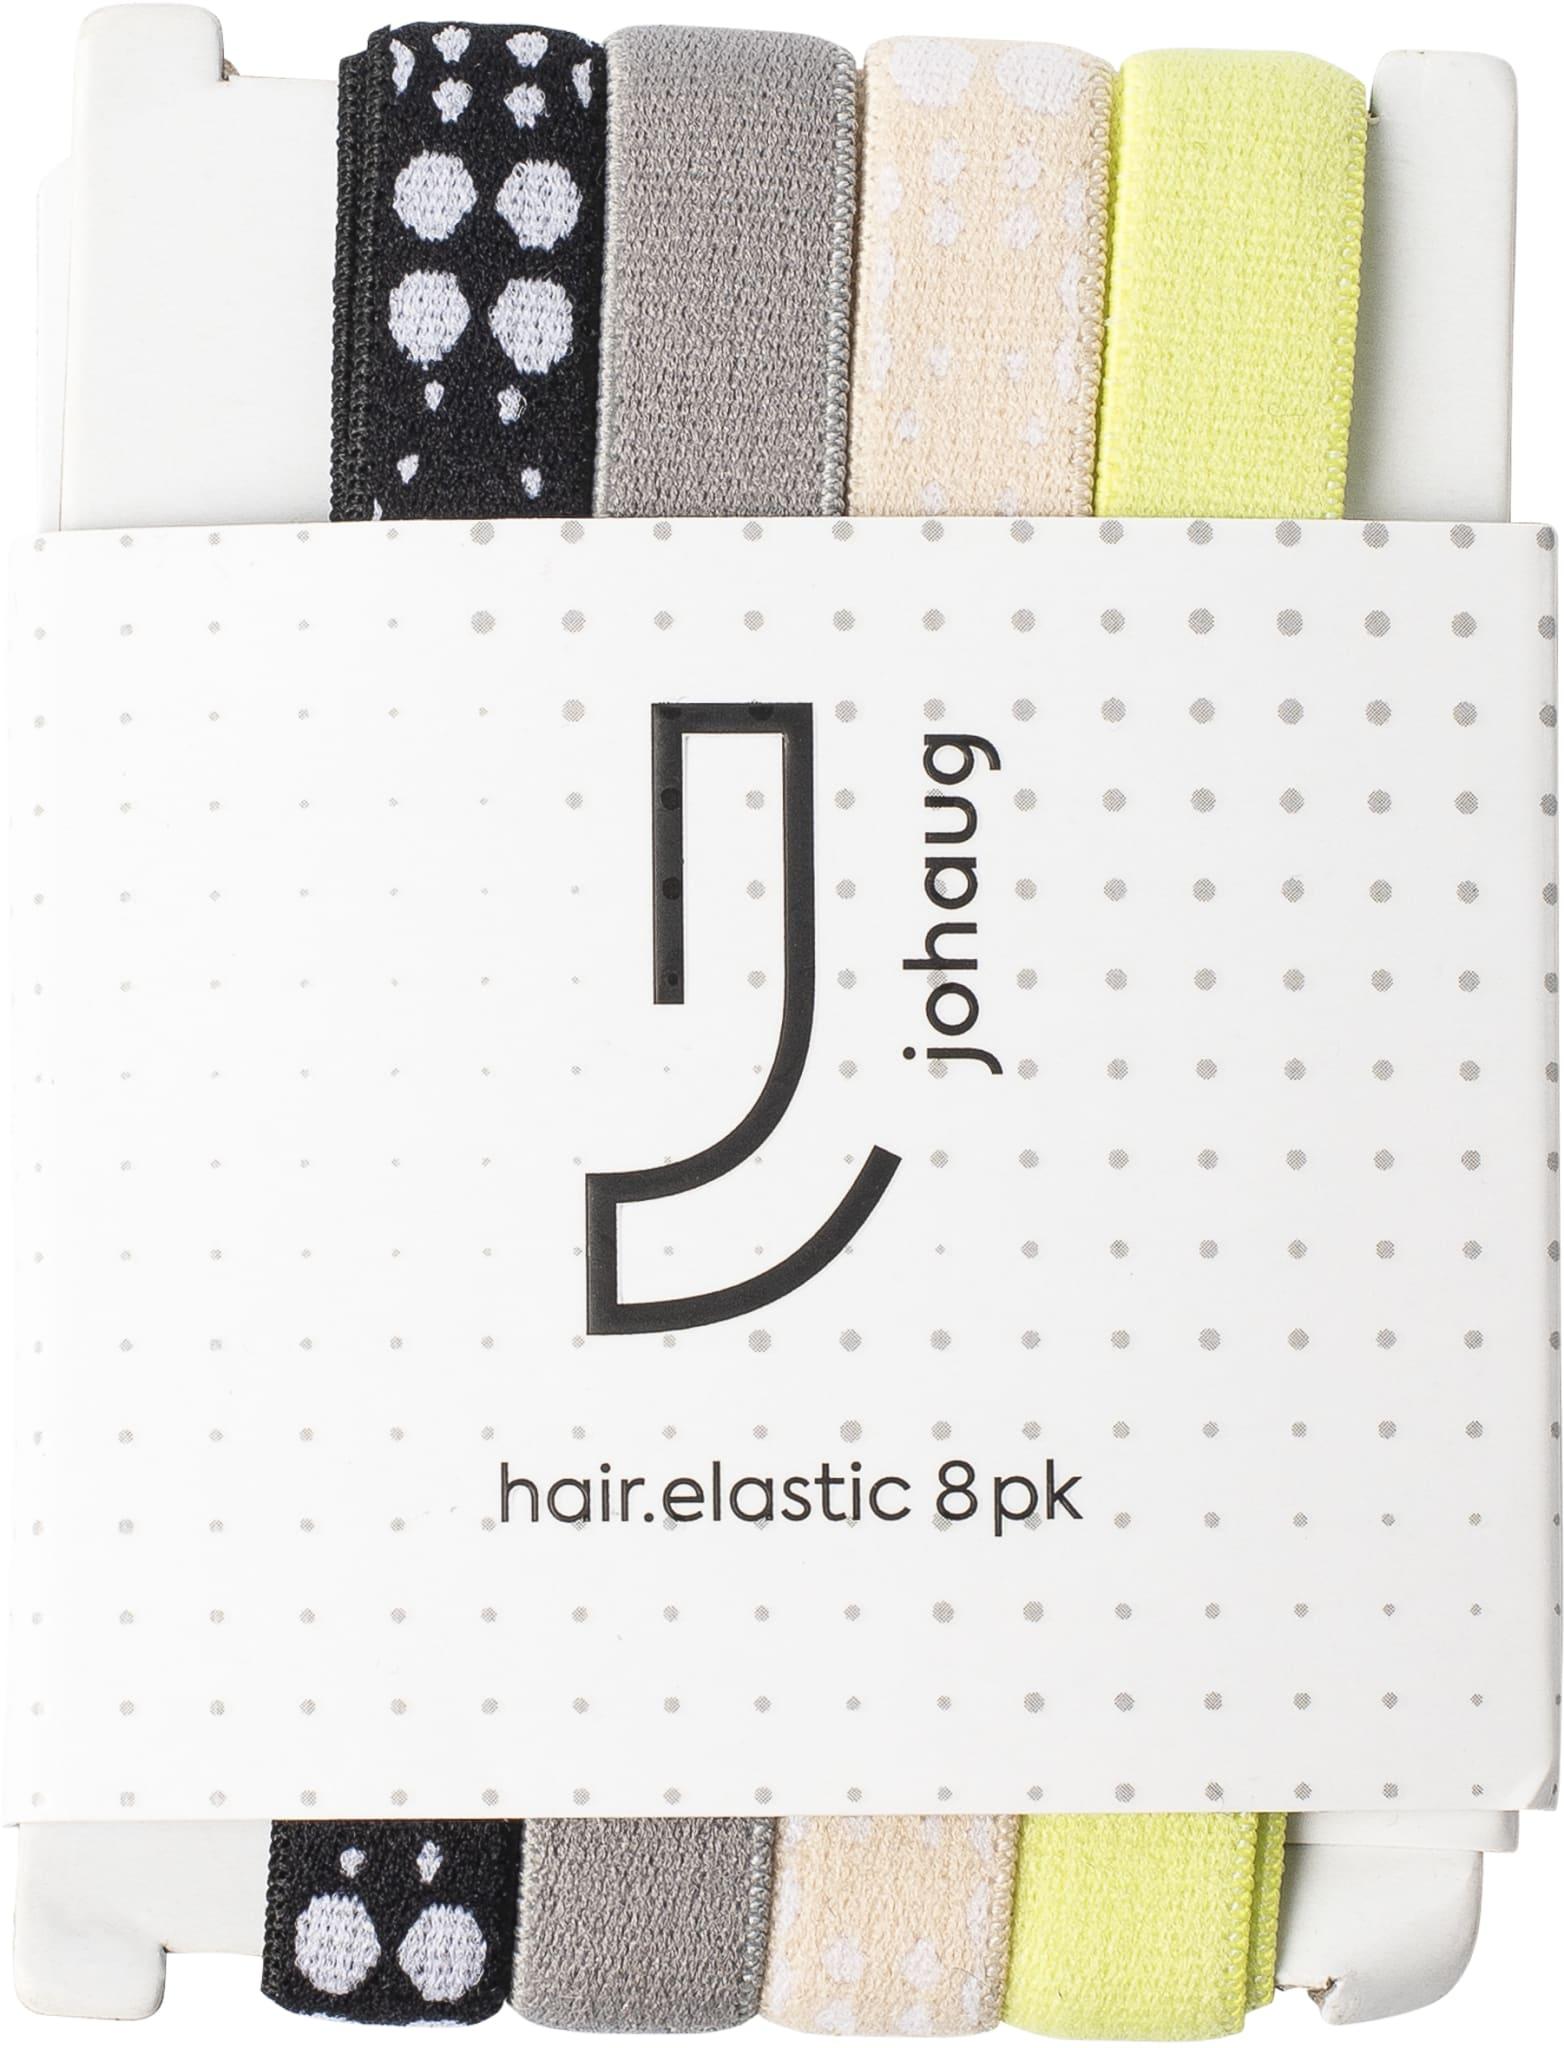 Hair Elastic 8pk